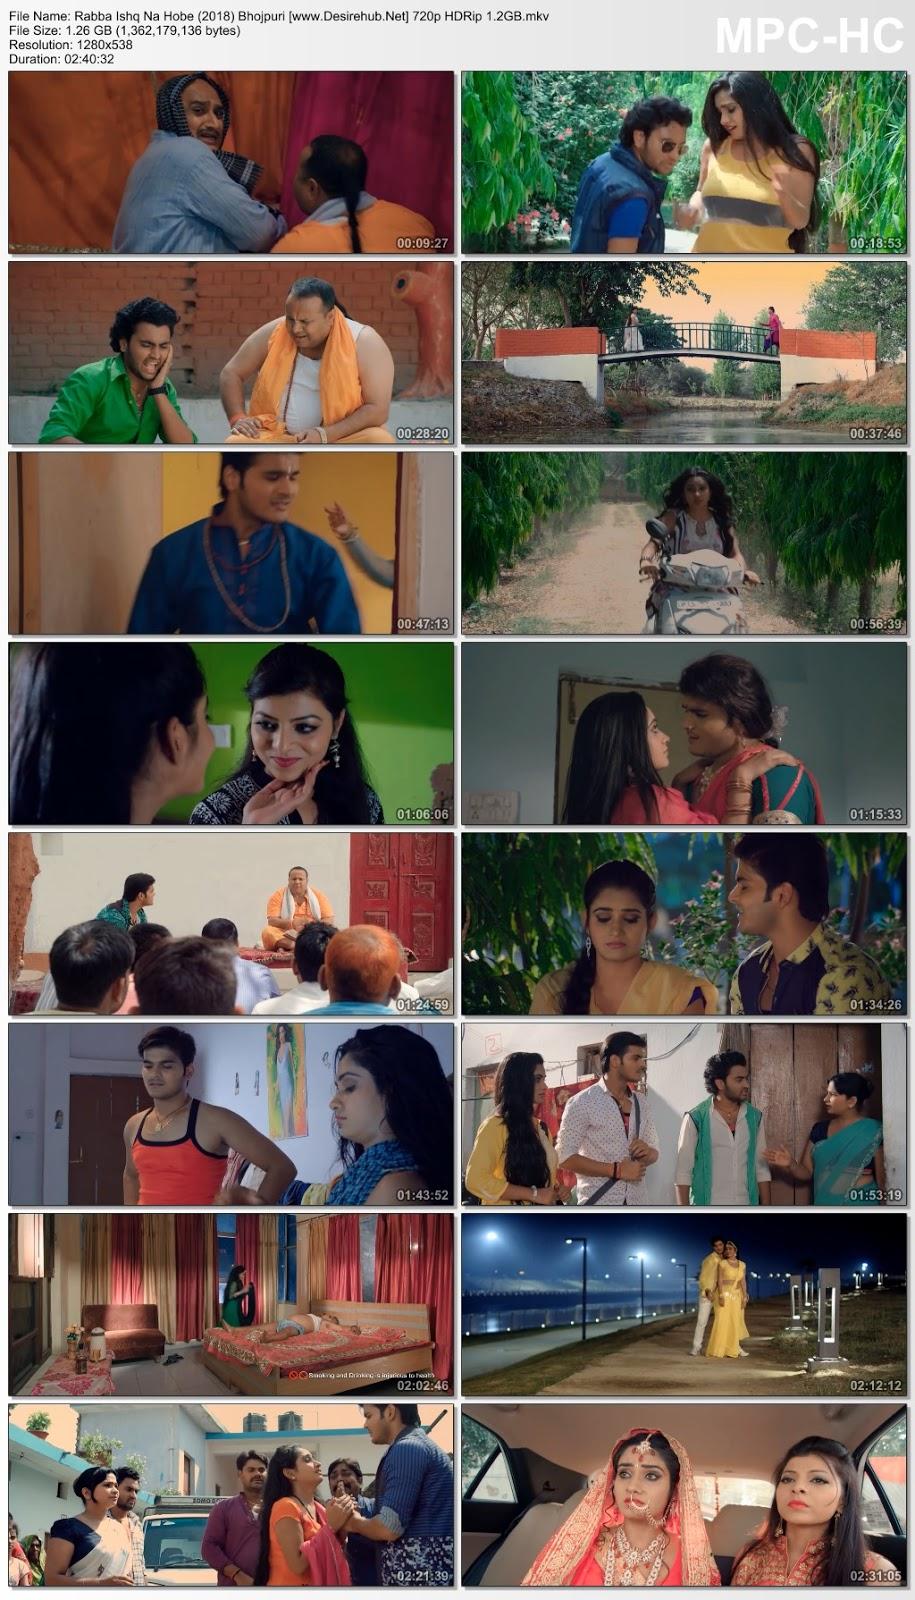 Rabba Ishq Na Hobe (2018) Bhojpuri 720p WEB HDRip 1.2GB Desirehub